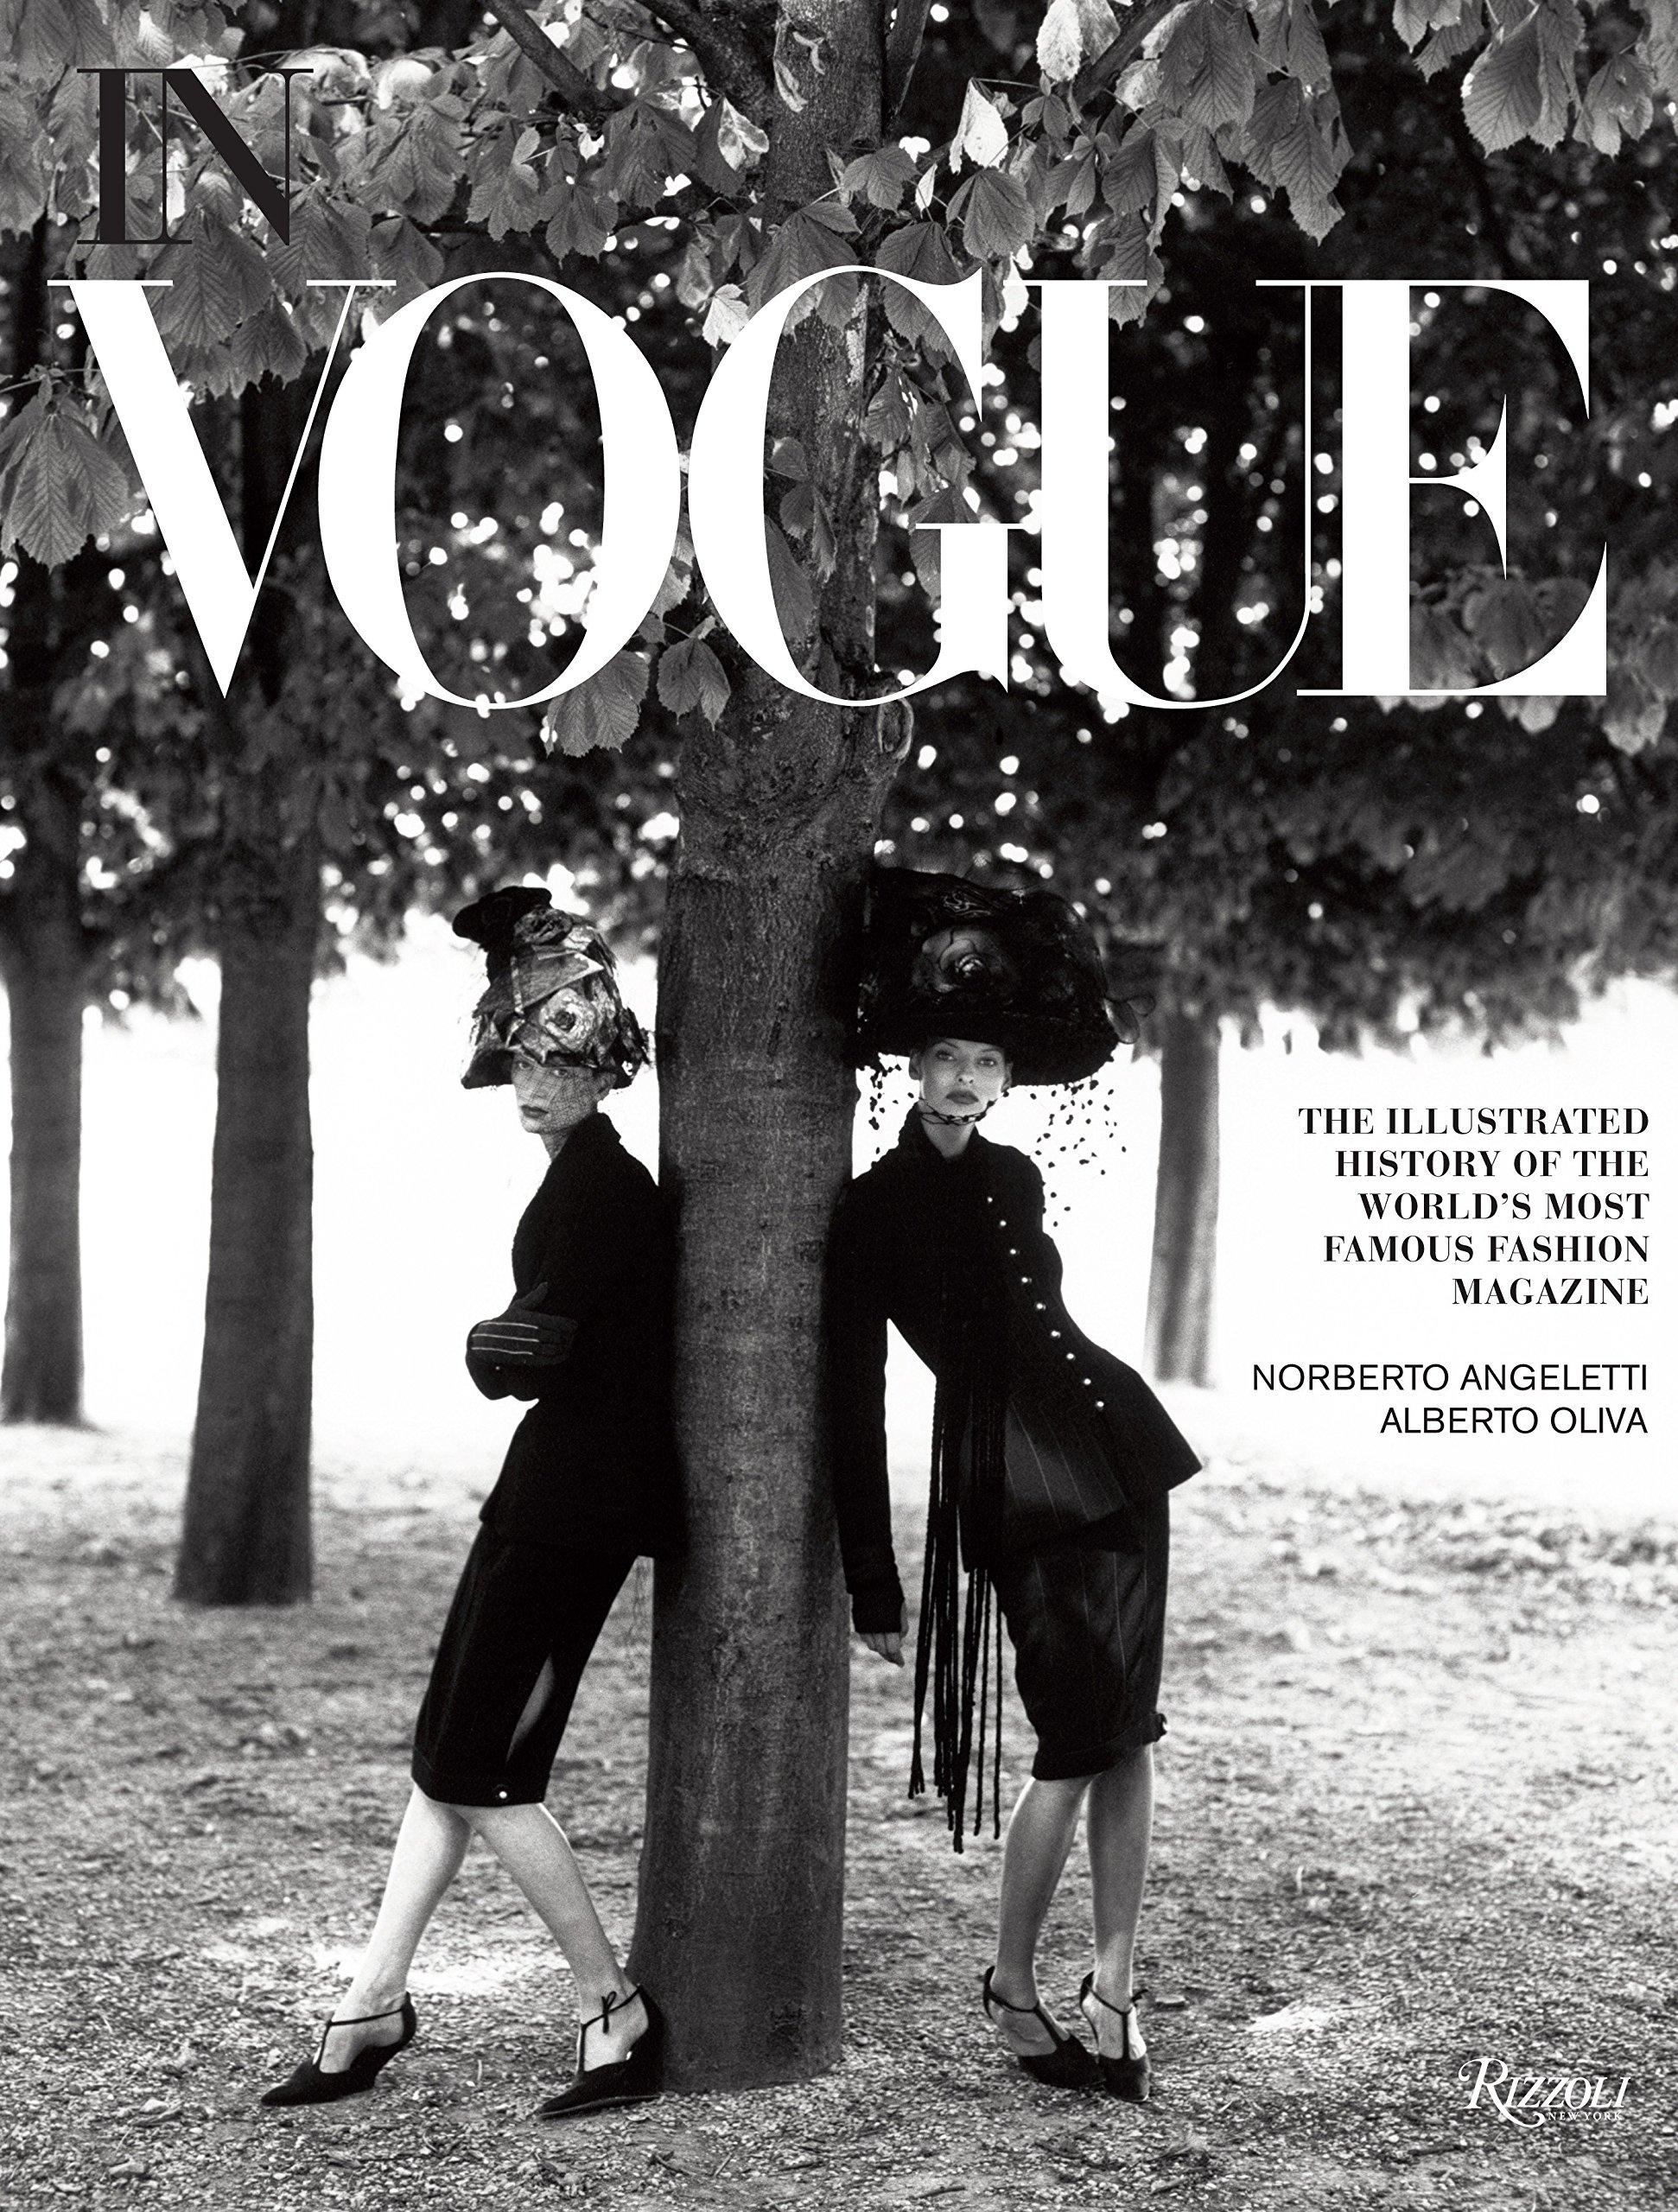 In Vogue An Illustrated History Of The World S Most Famous Fashion Magazine Oliva Alberto Angeletti Norberto Wintour Anna 8601415771039 Amazon Com Books